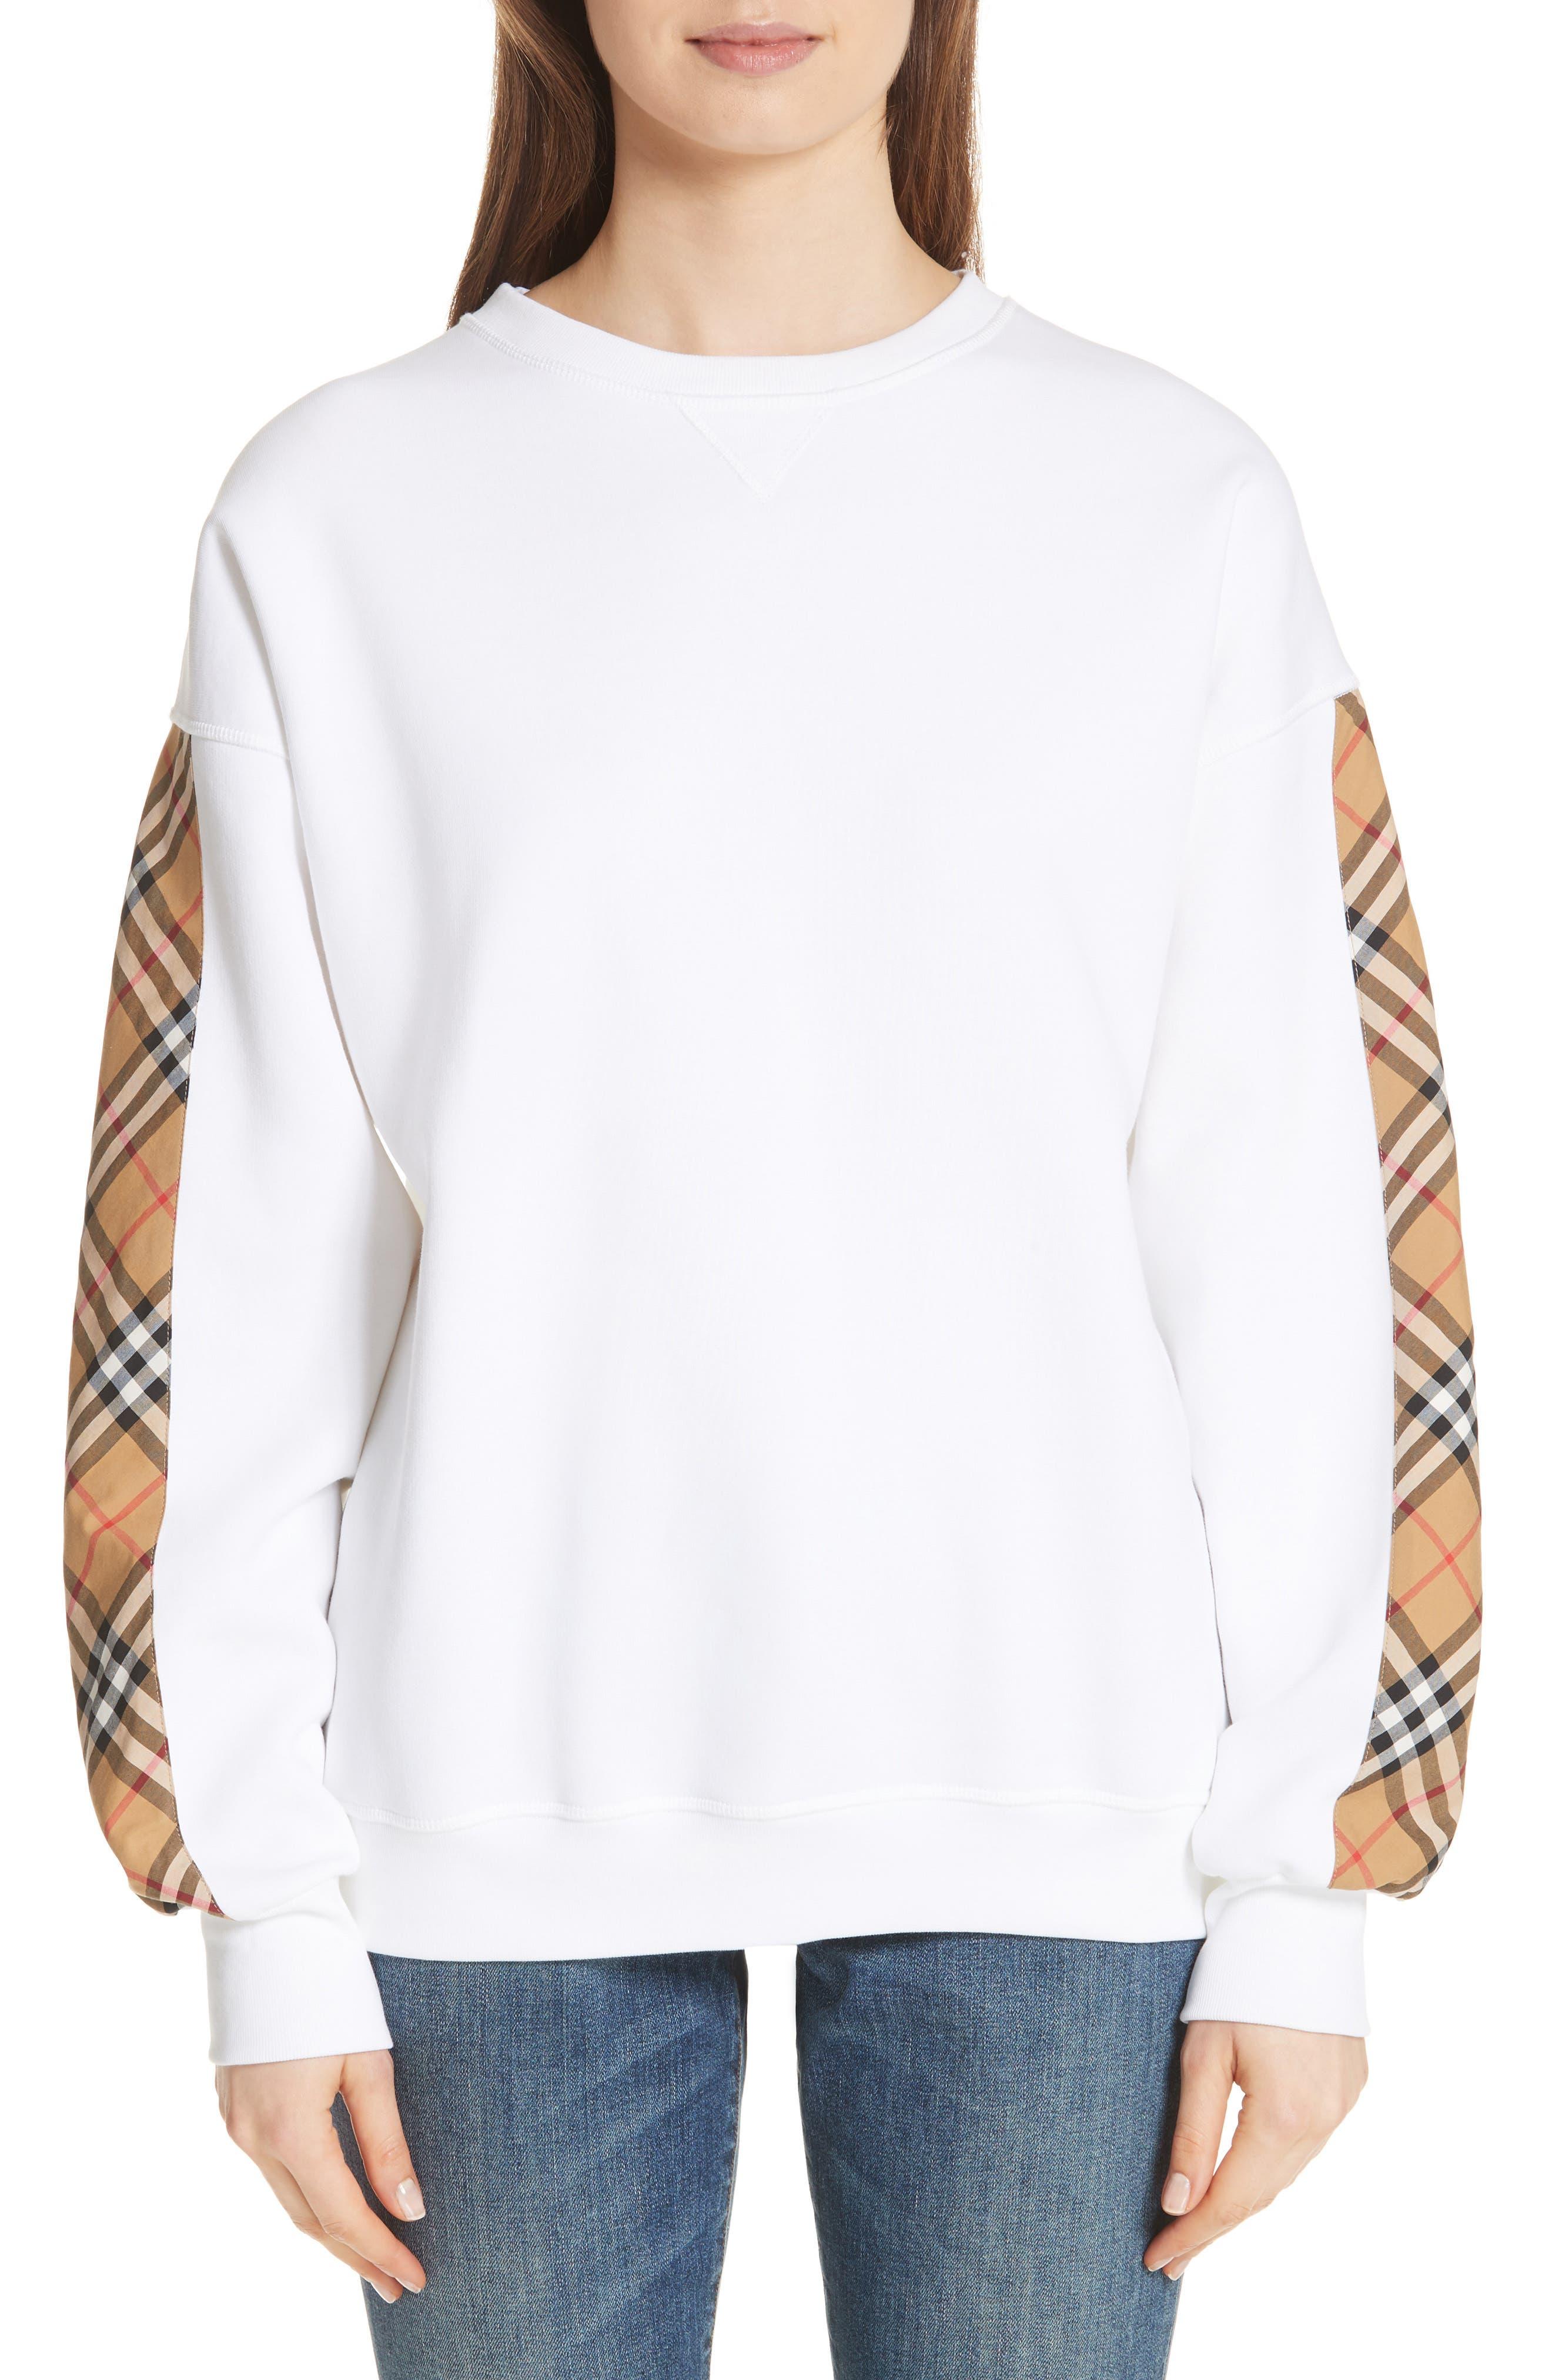 1a1f2a4335 Burberry Women s Tops   Shirts